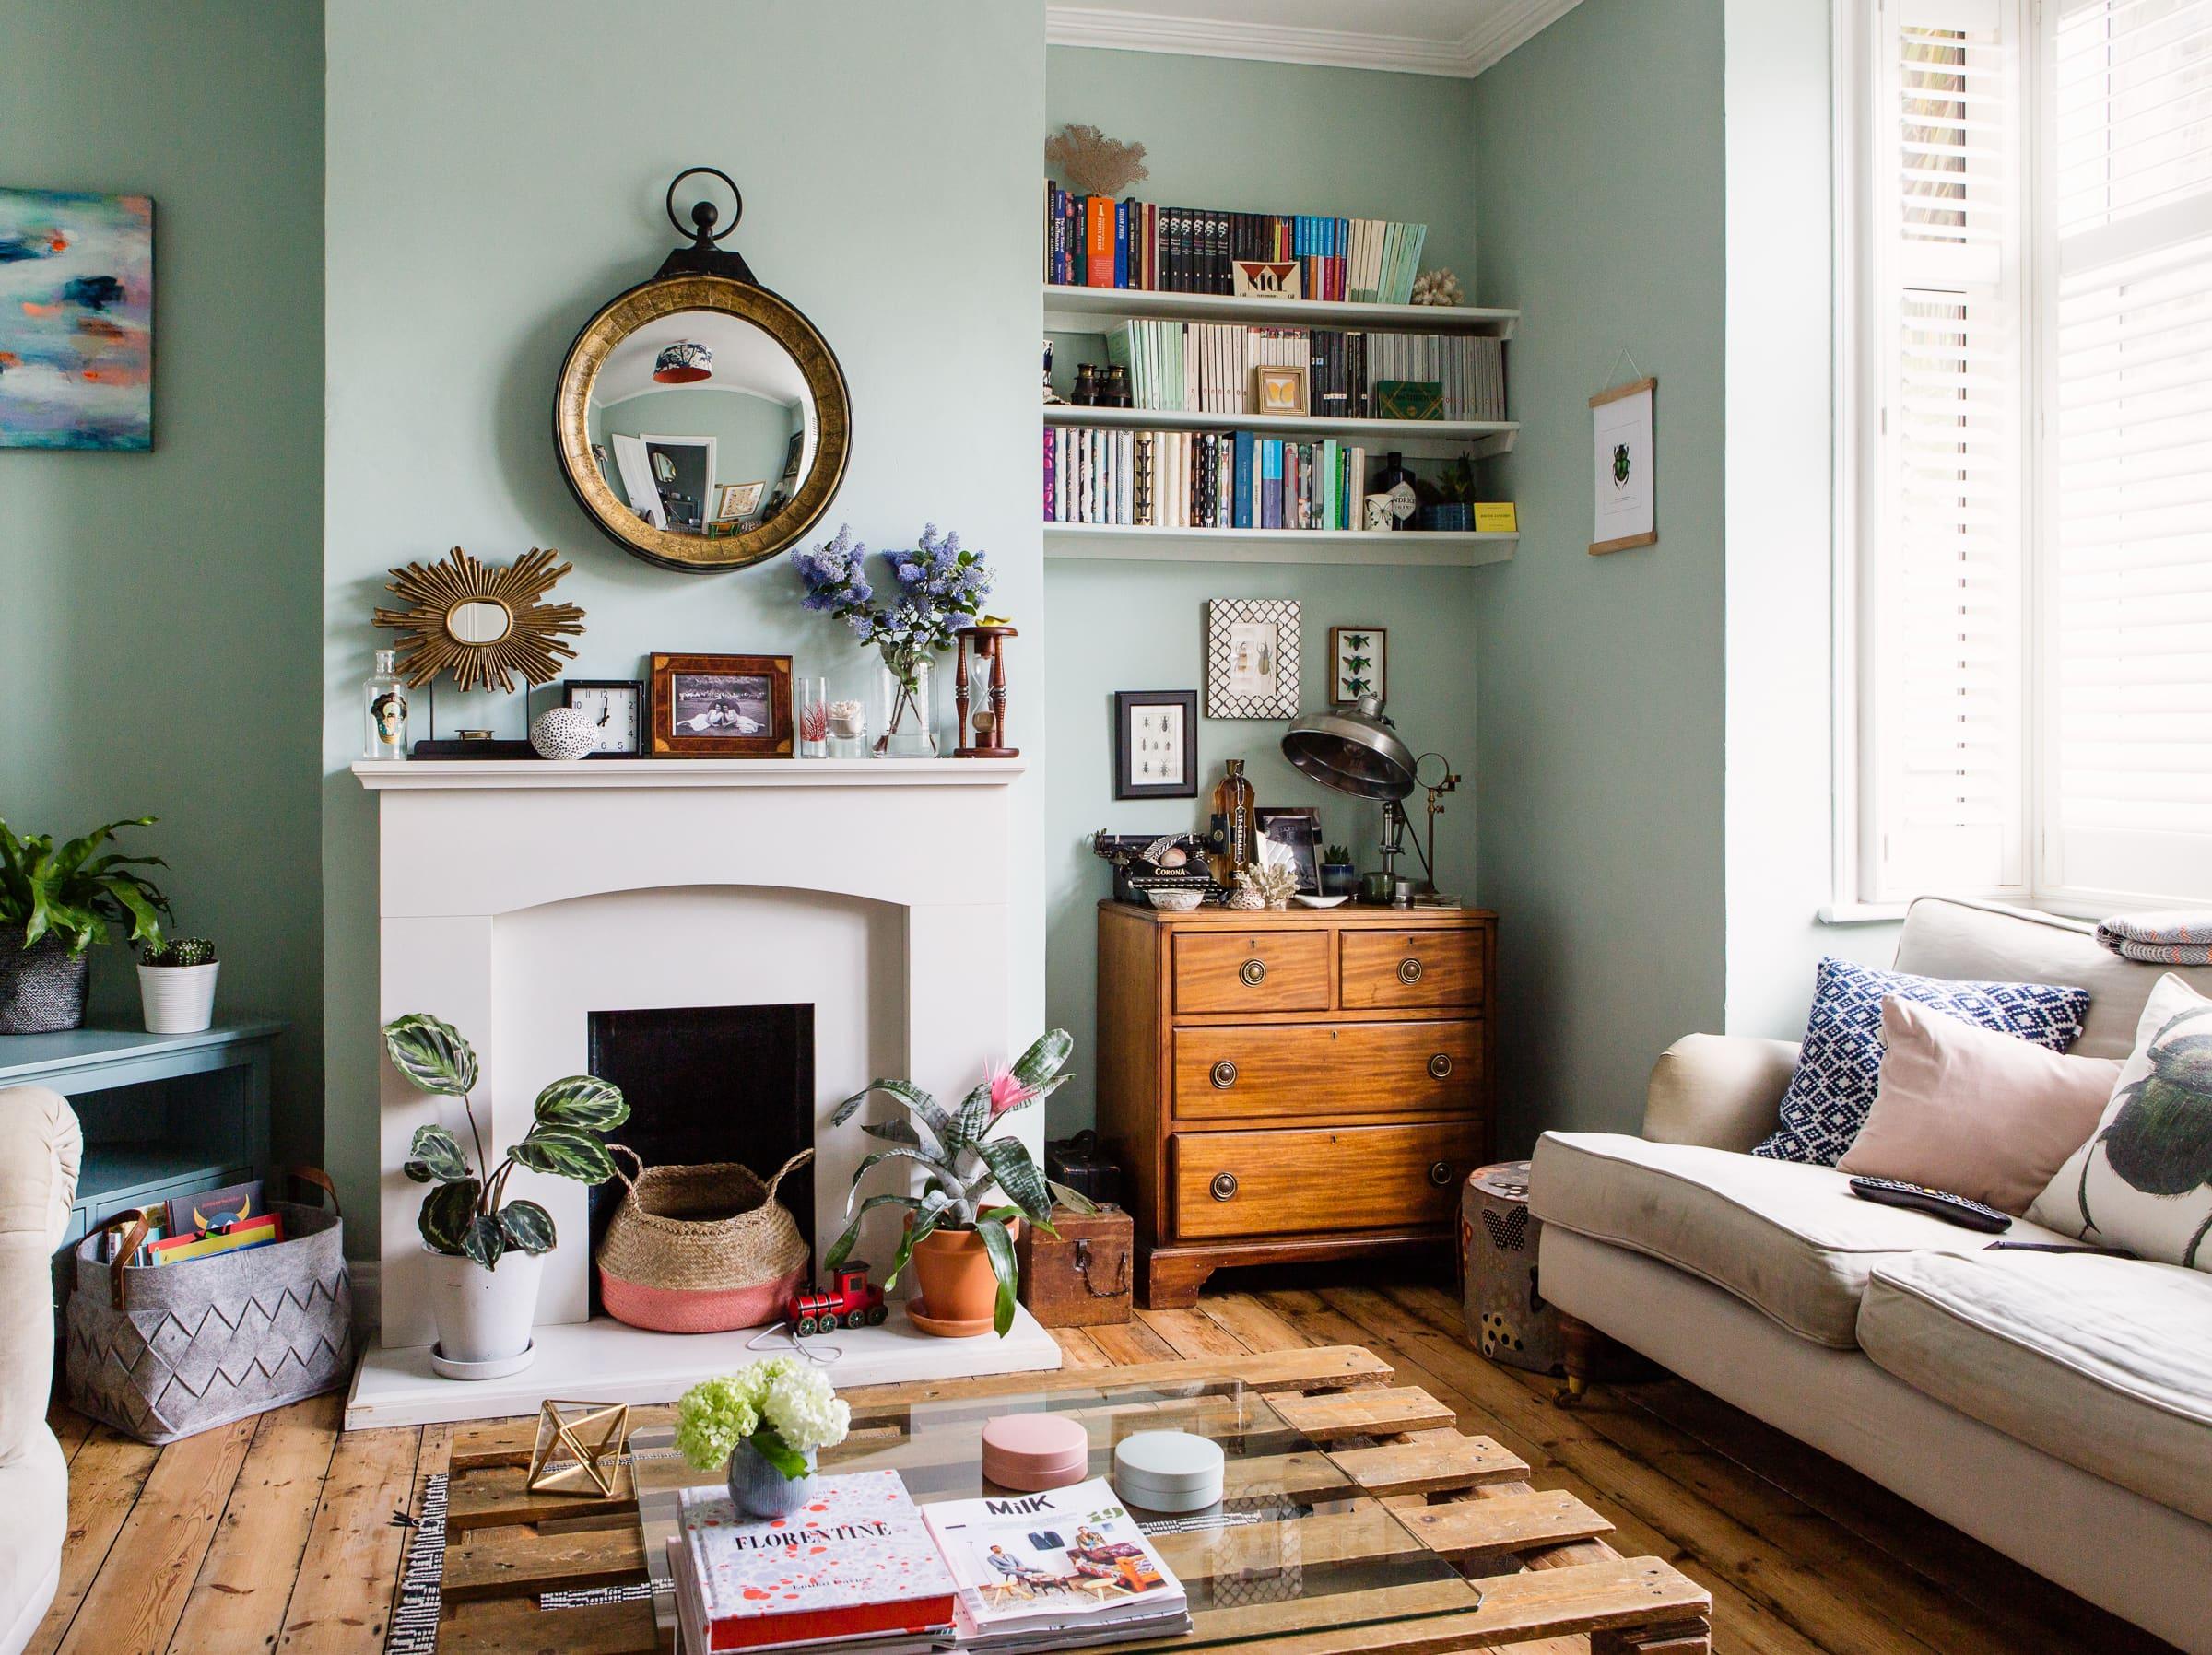 Best Small Living Room Design Ideas   Apartment Therapy on Small Living Room Ideas  id=13531